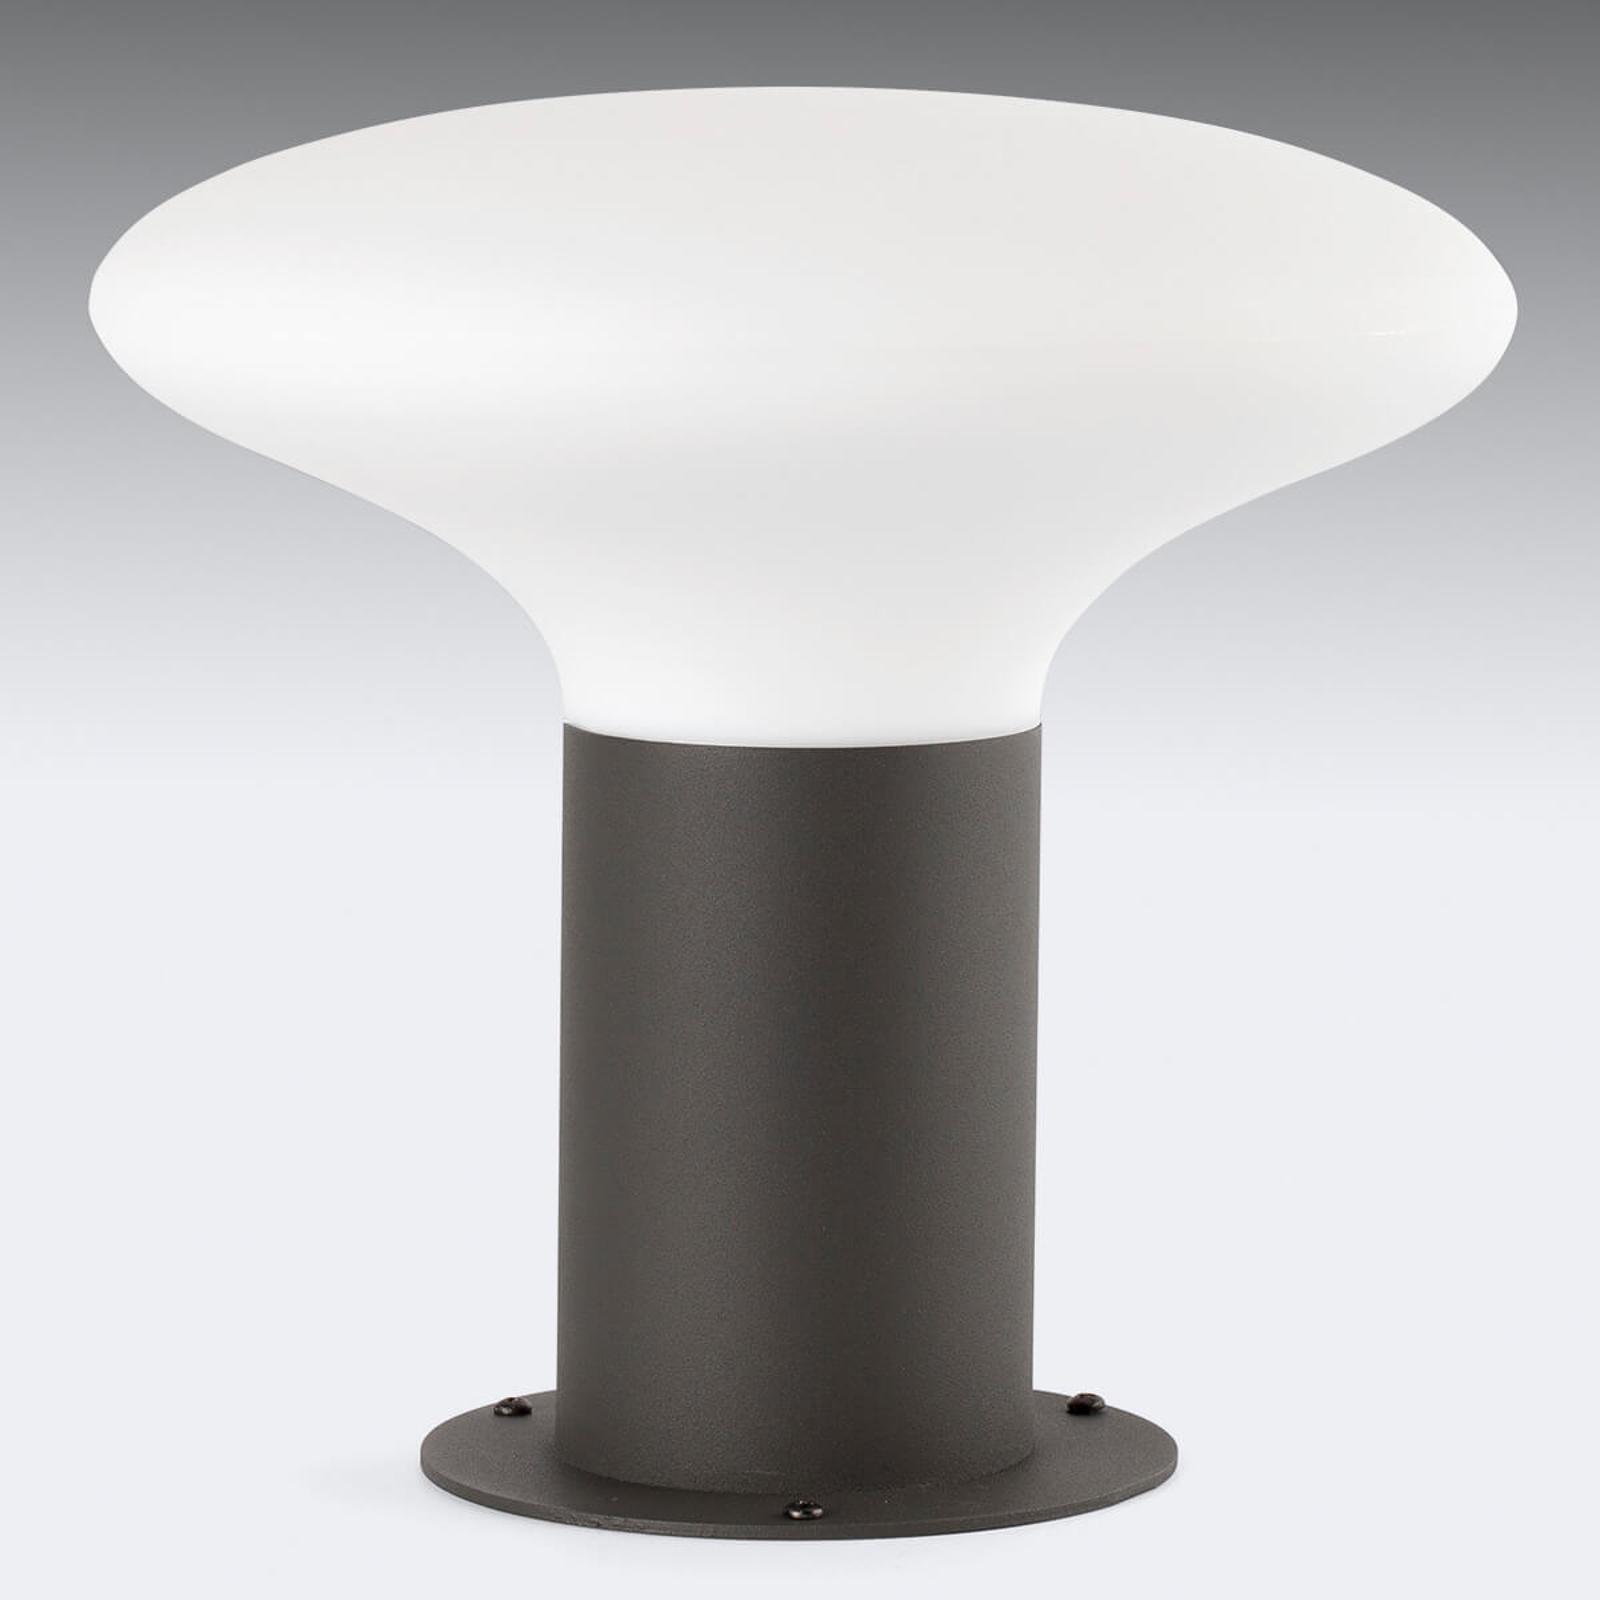 Lampioncino LED Blub's, 24 cm